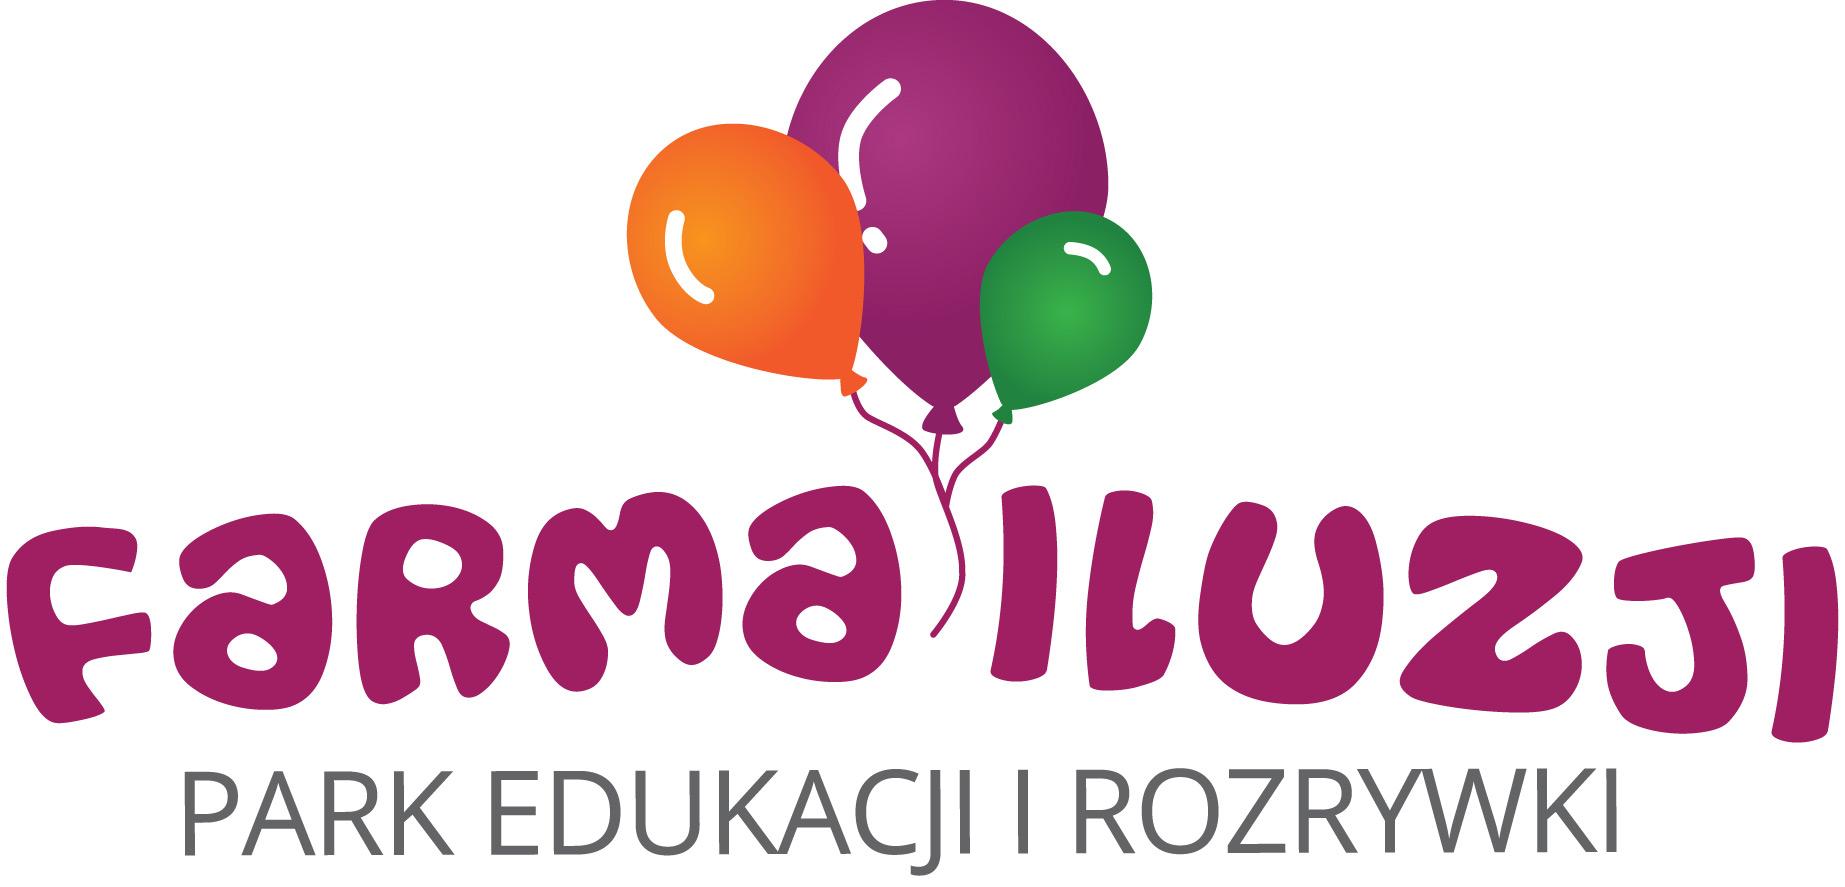 farma_logo2